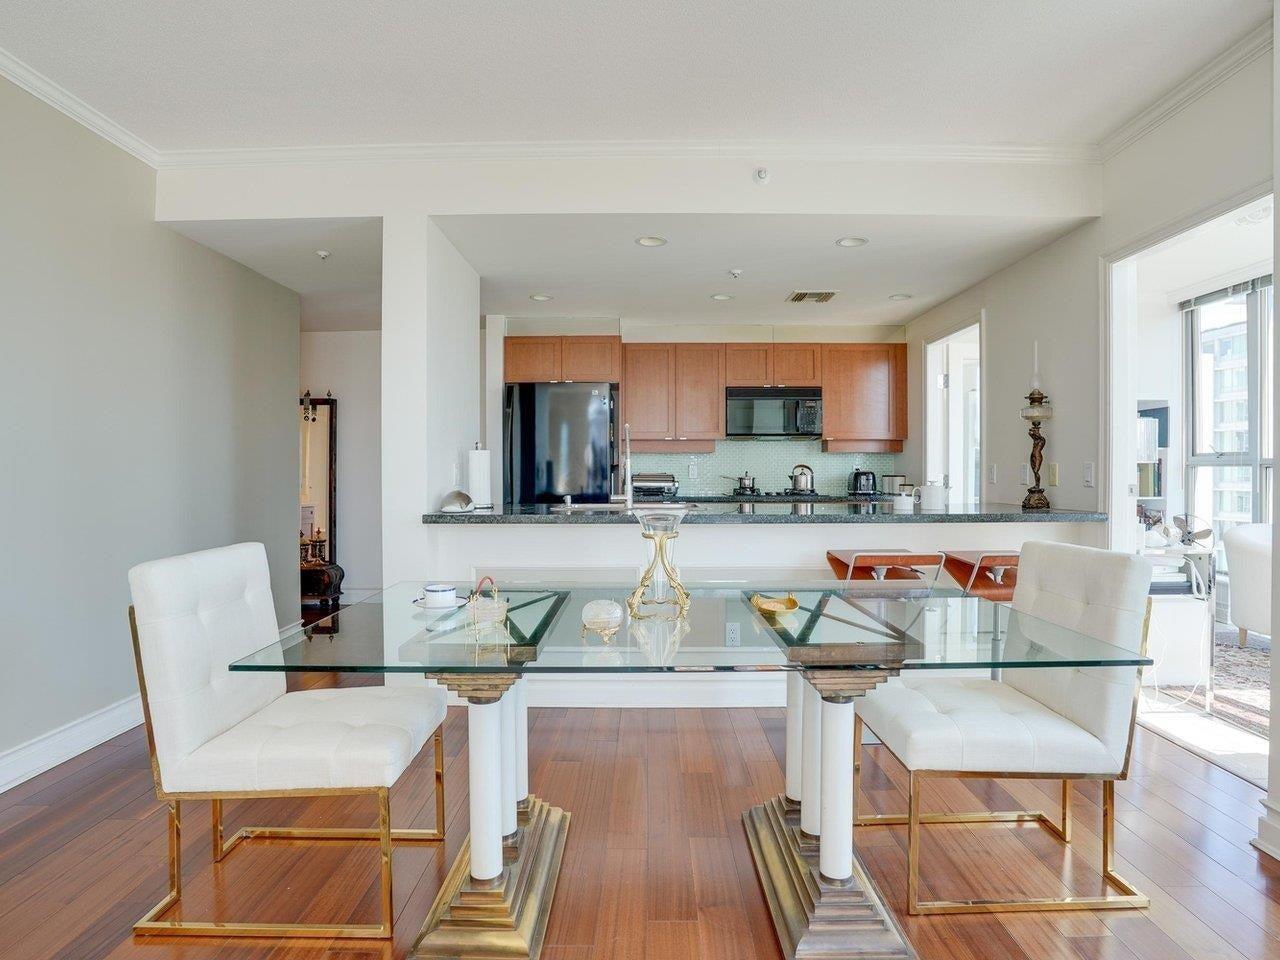 1003 1790 BAYSHORE DRIVE - Coal Harbour Apartment/Condo for sale, 1 Bedroom (R2606481) - #7